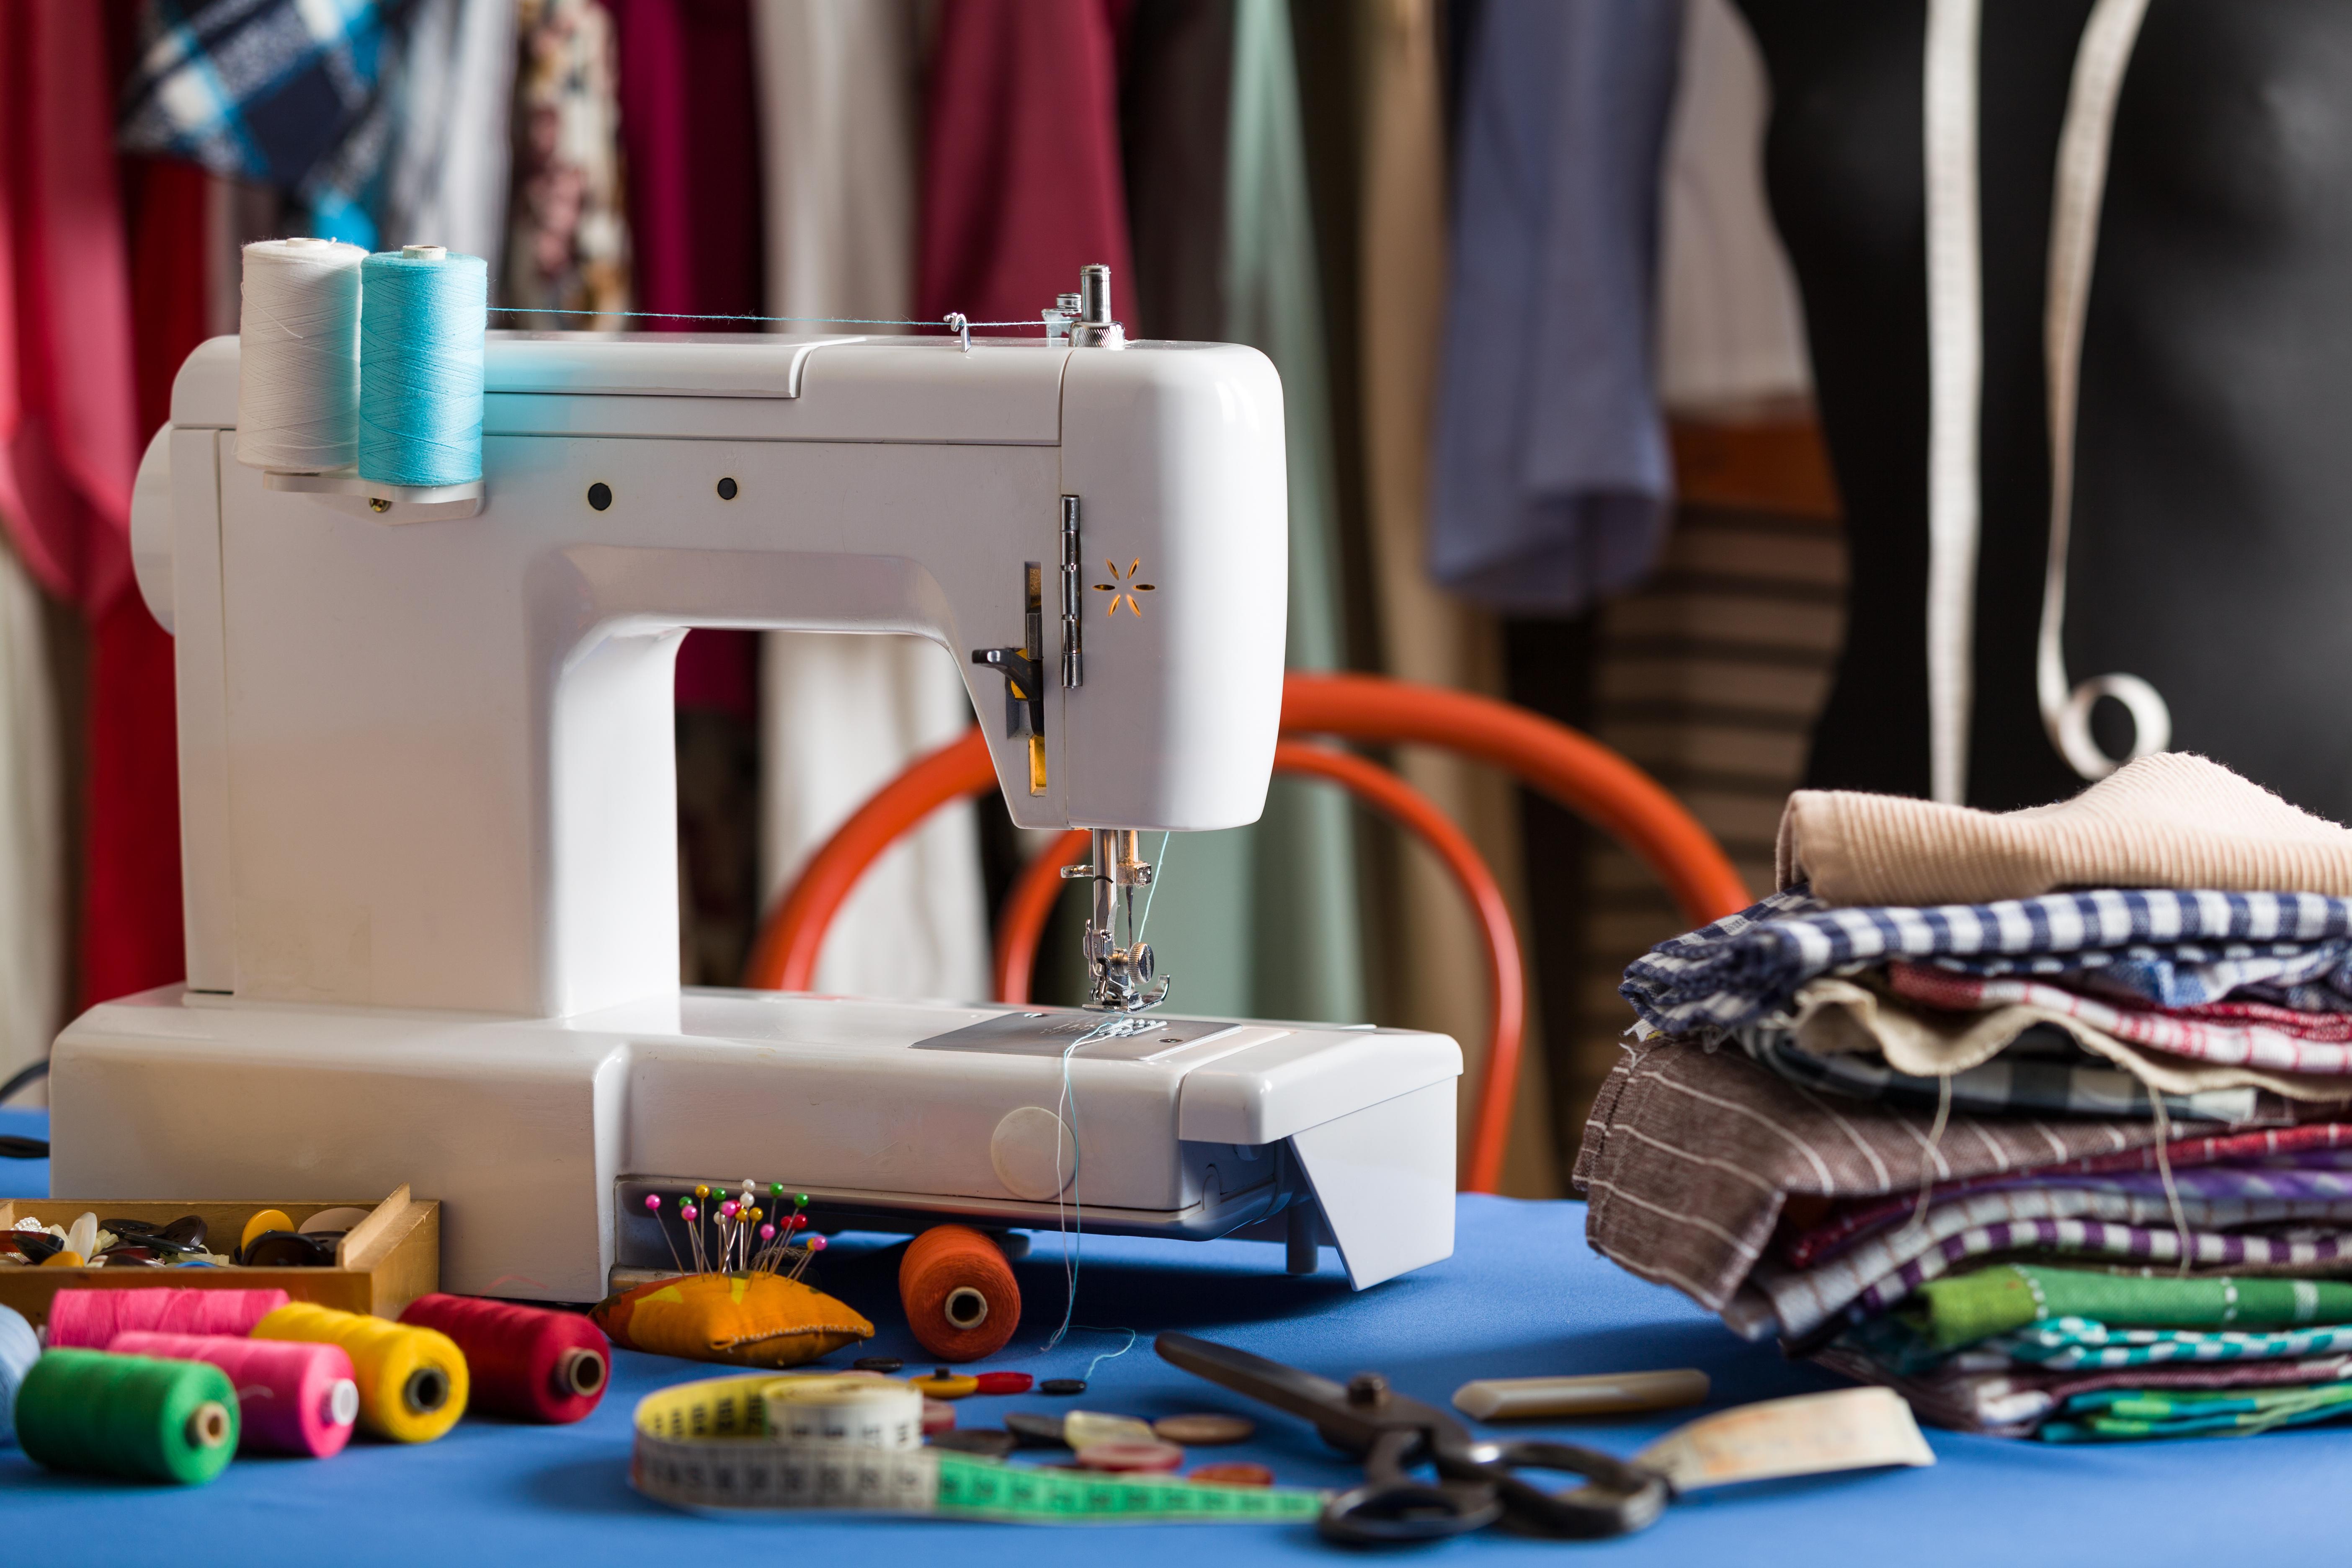 Markham sewing machine store Cosmos Sewing Machine Co